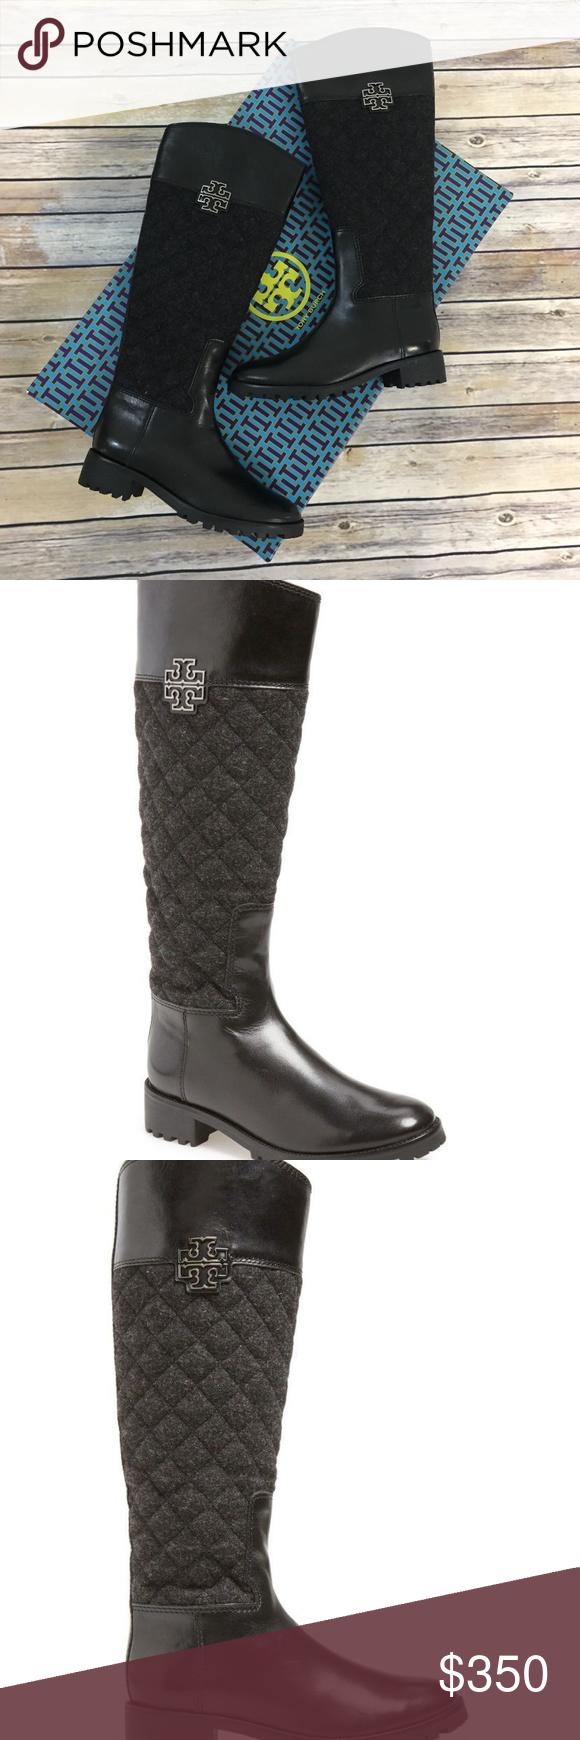 7ca986b6766 NEW Tory Burch Melinda Riding Boots 7.5 Black New Tory Burch Melinda ...